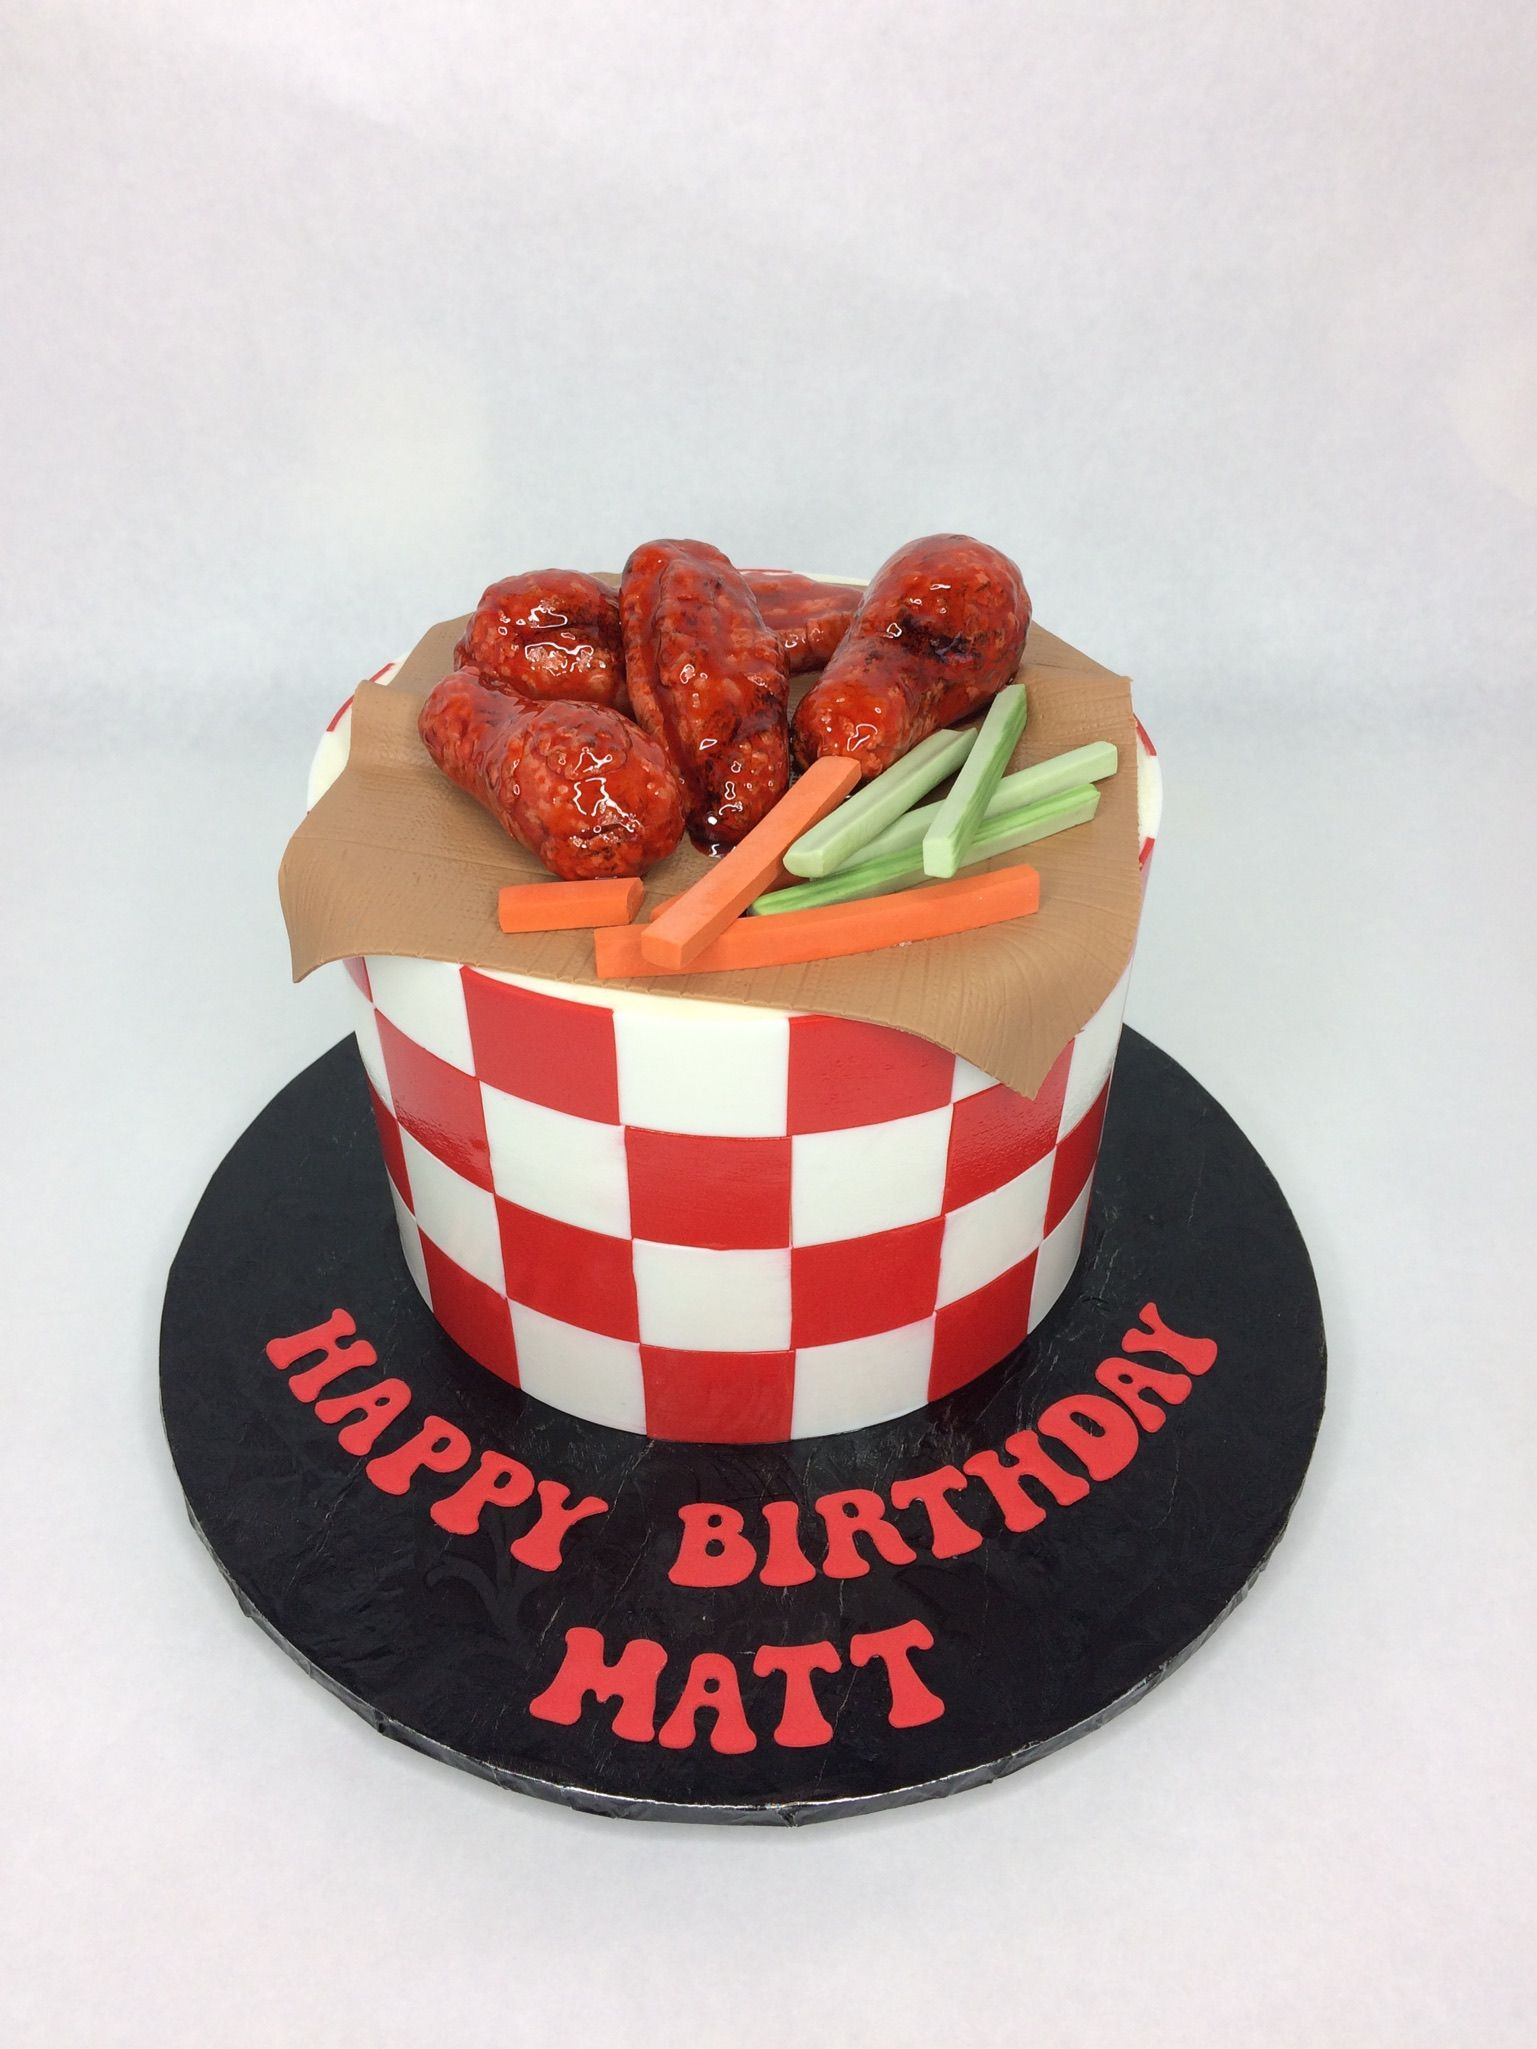 Chicken wings cake custom cakes food cakes seattle